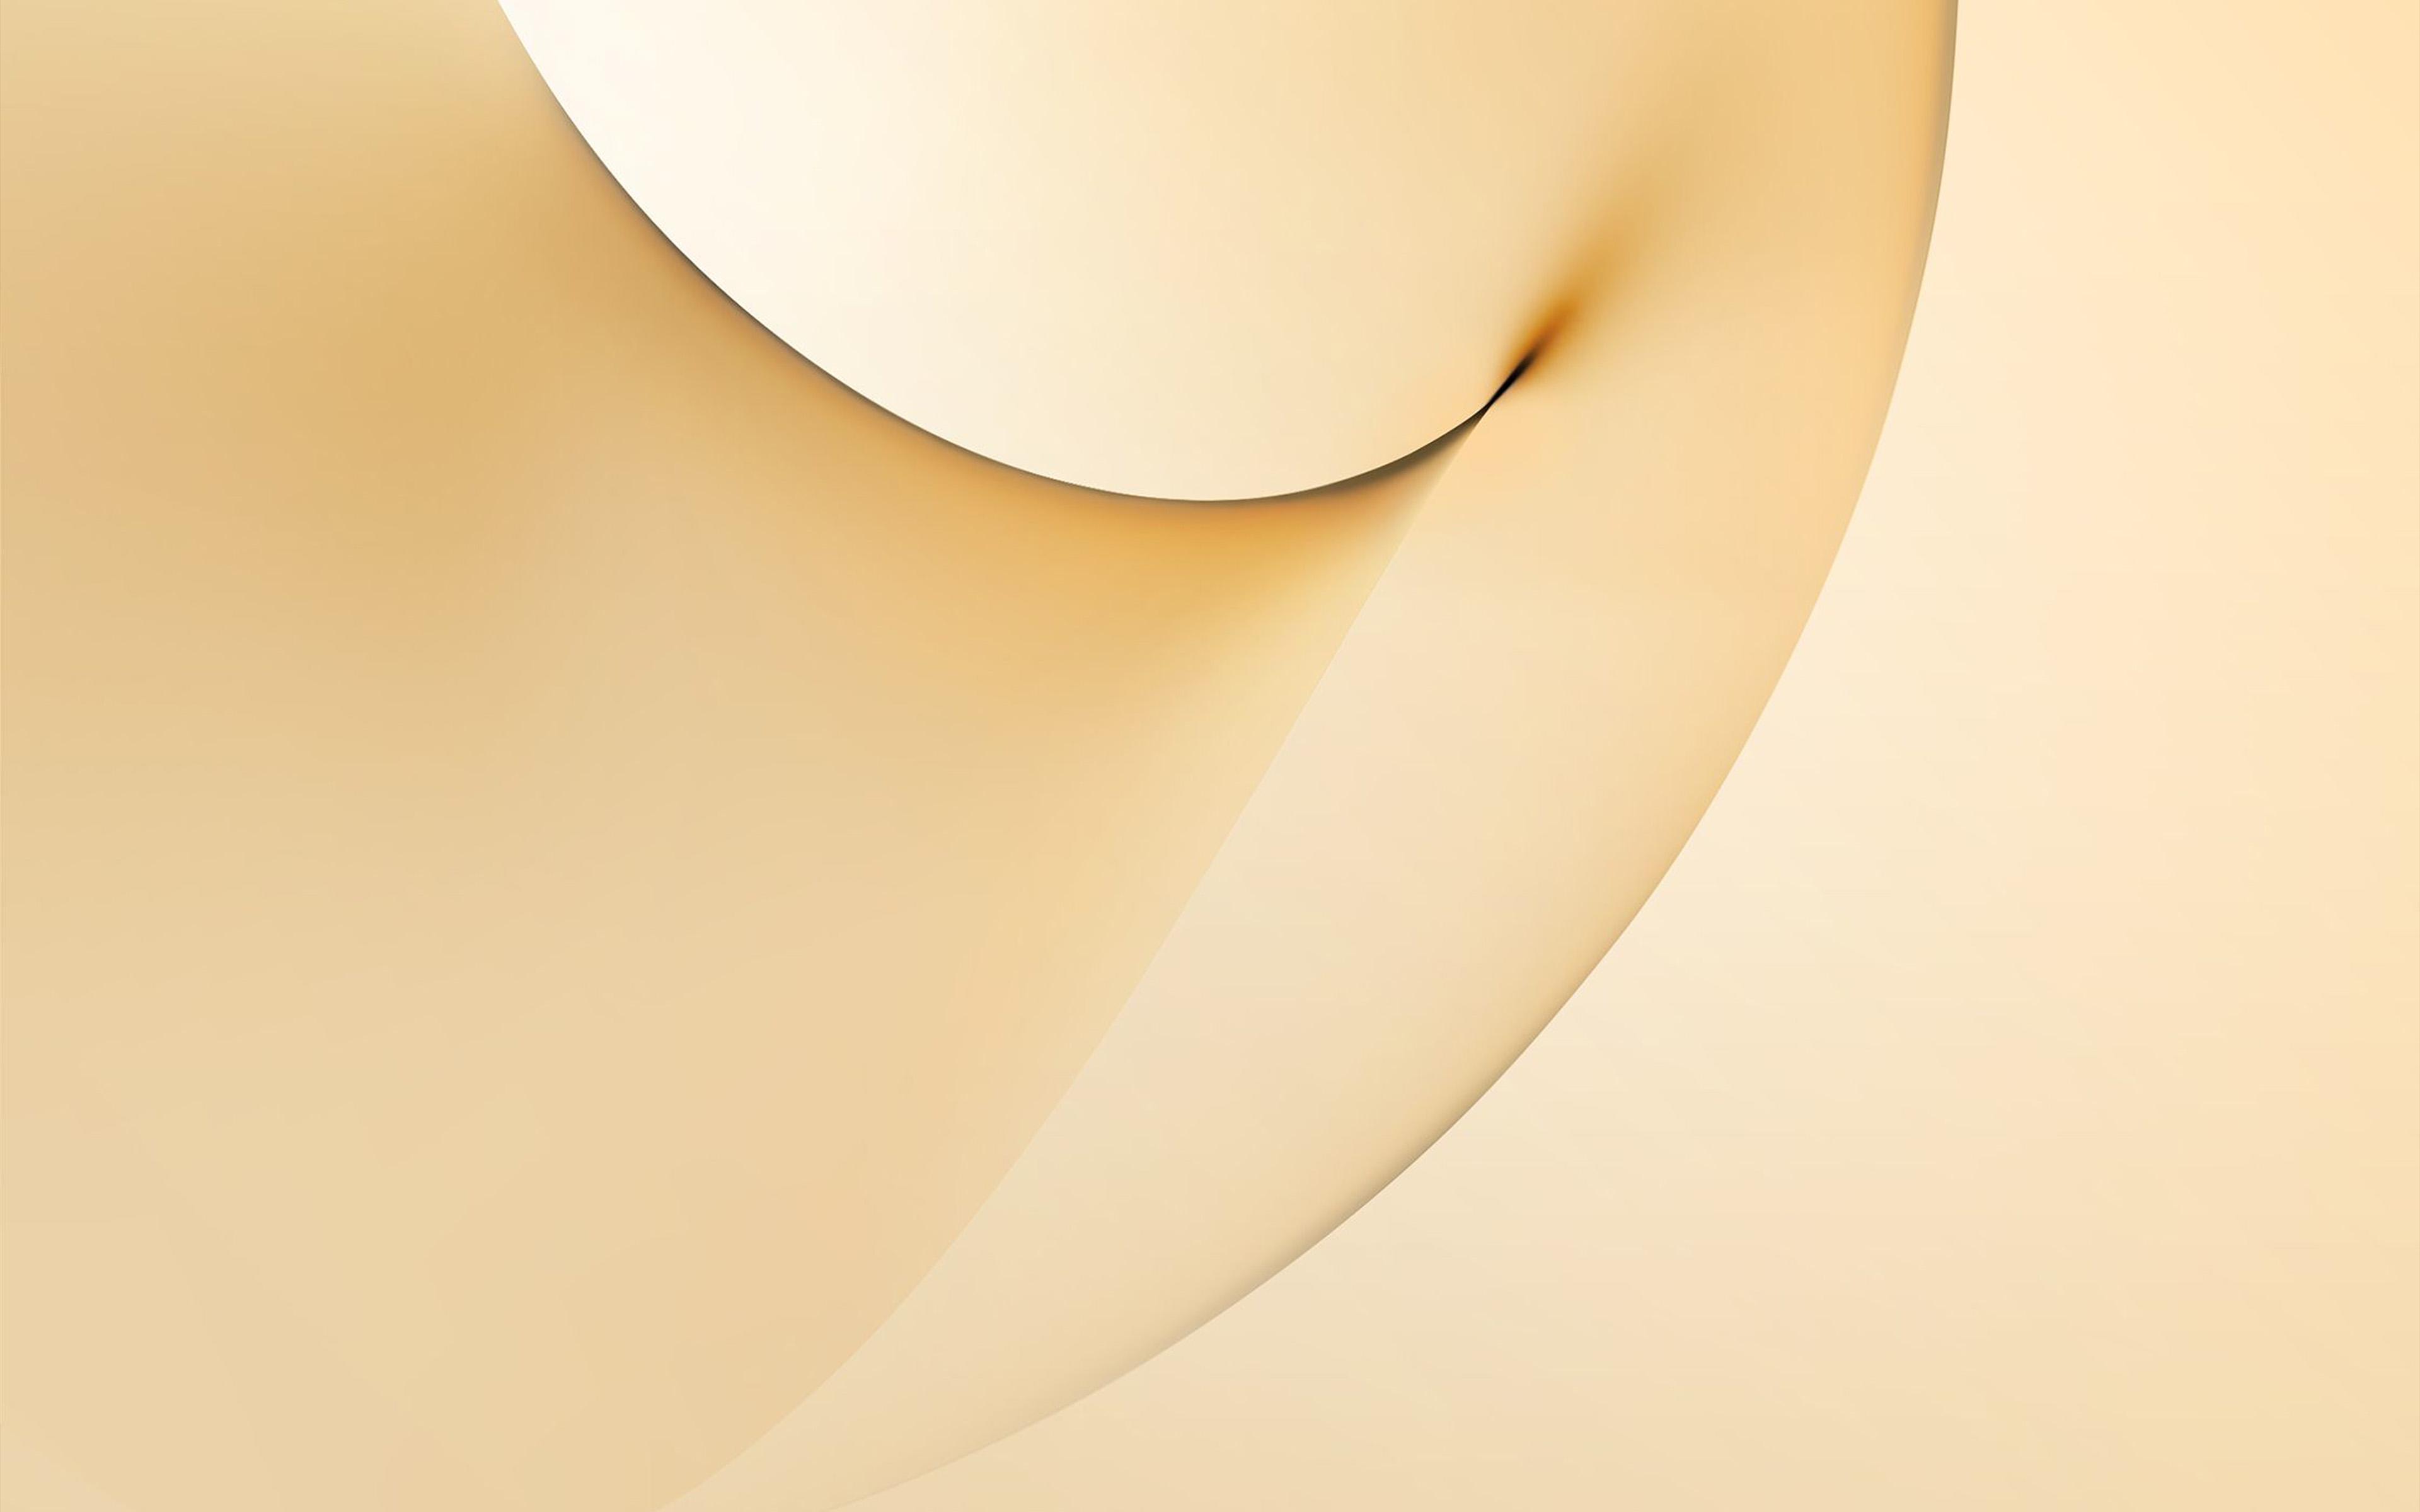 Vt78 Curve Samsung Galaxy Art Yellow Pattern Wallpaper